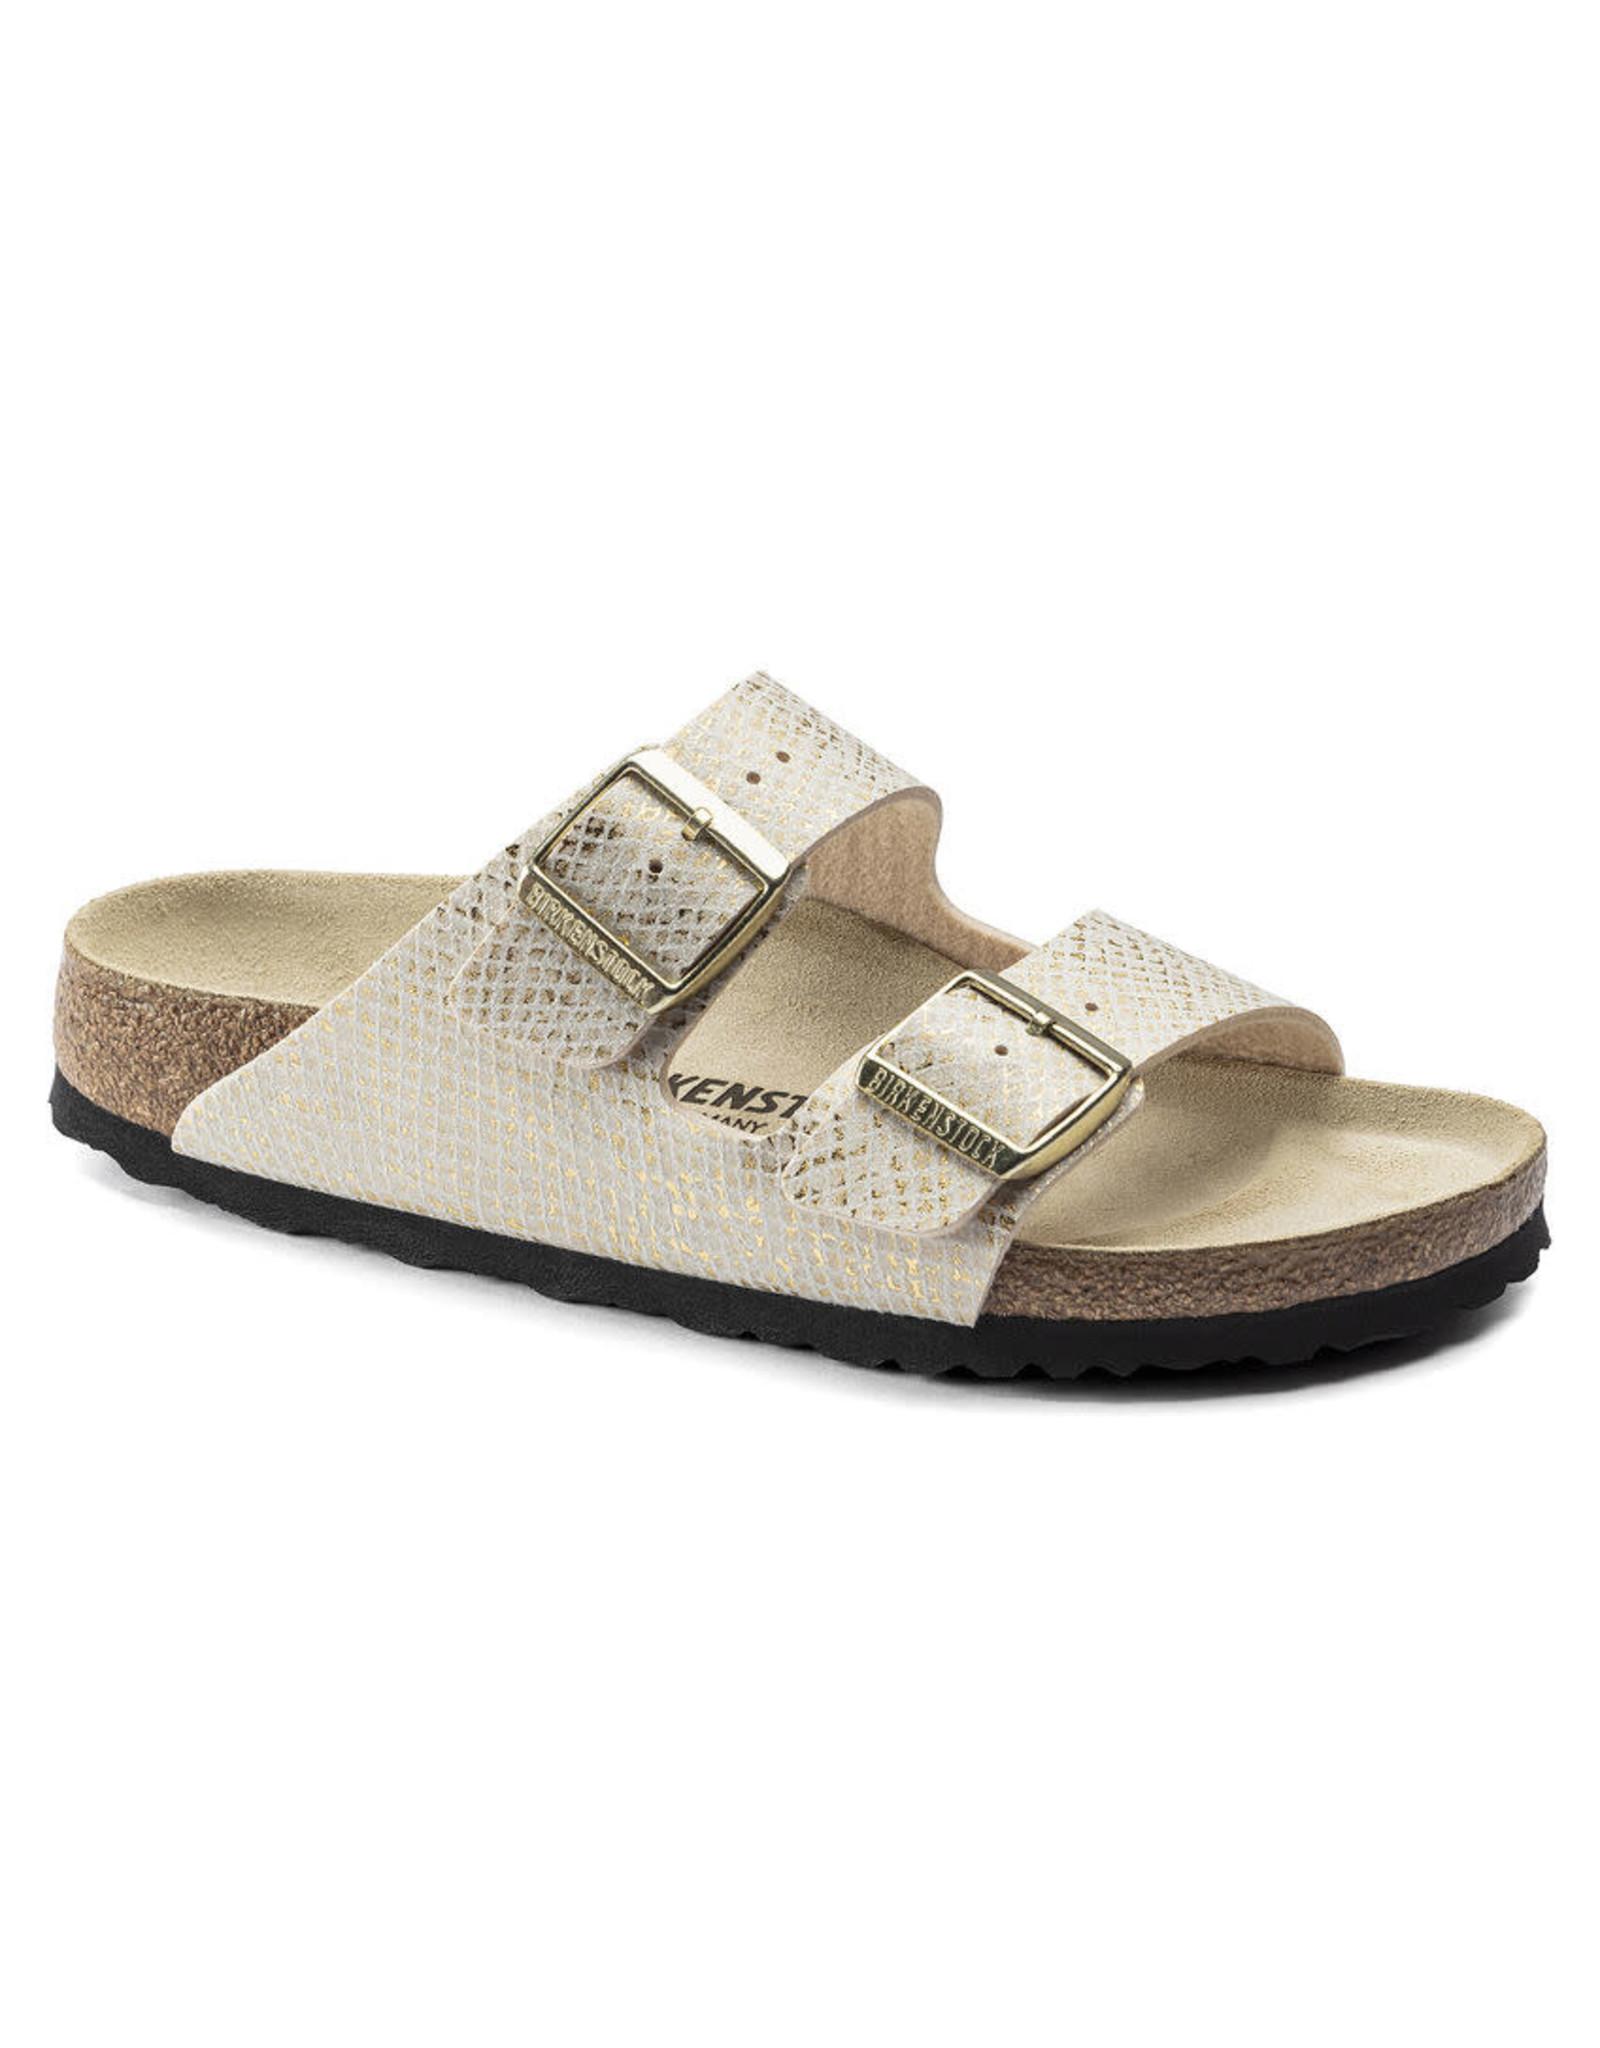 Birkenstock Arizona Shiny Python Microfiber Sandal